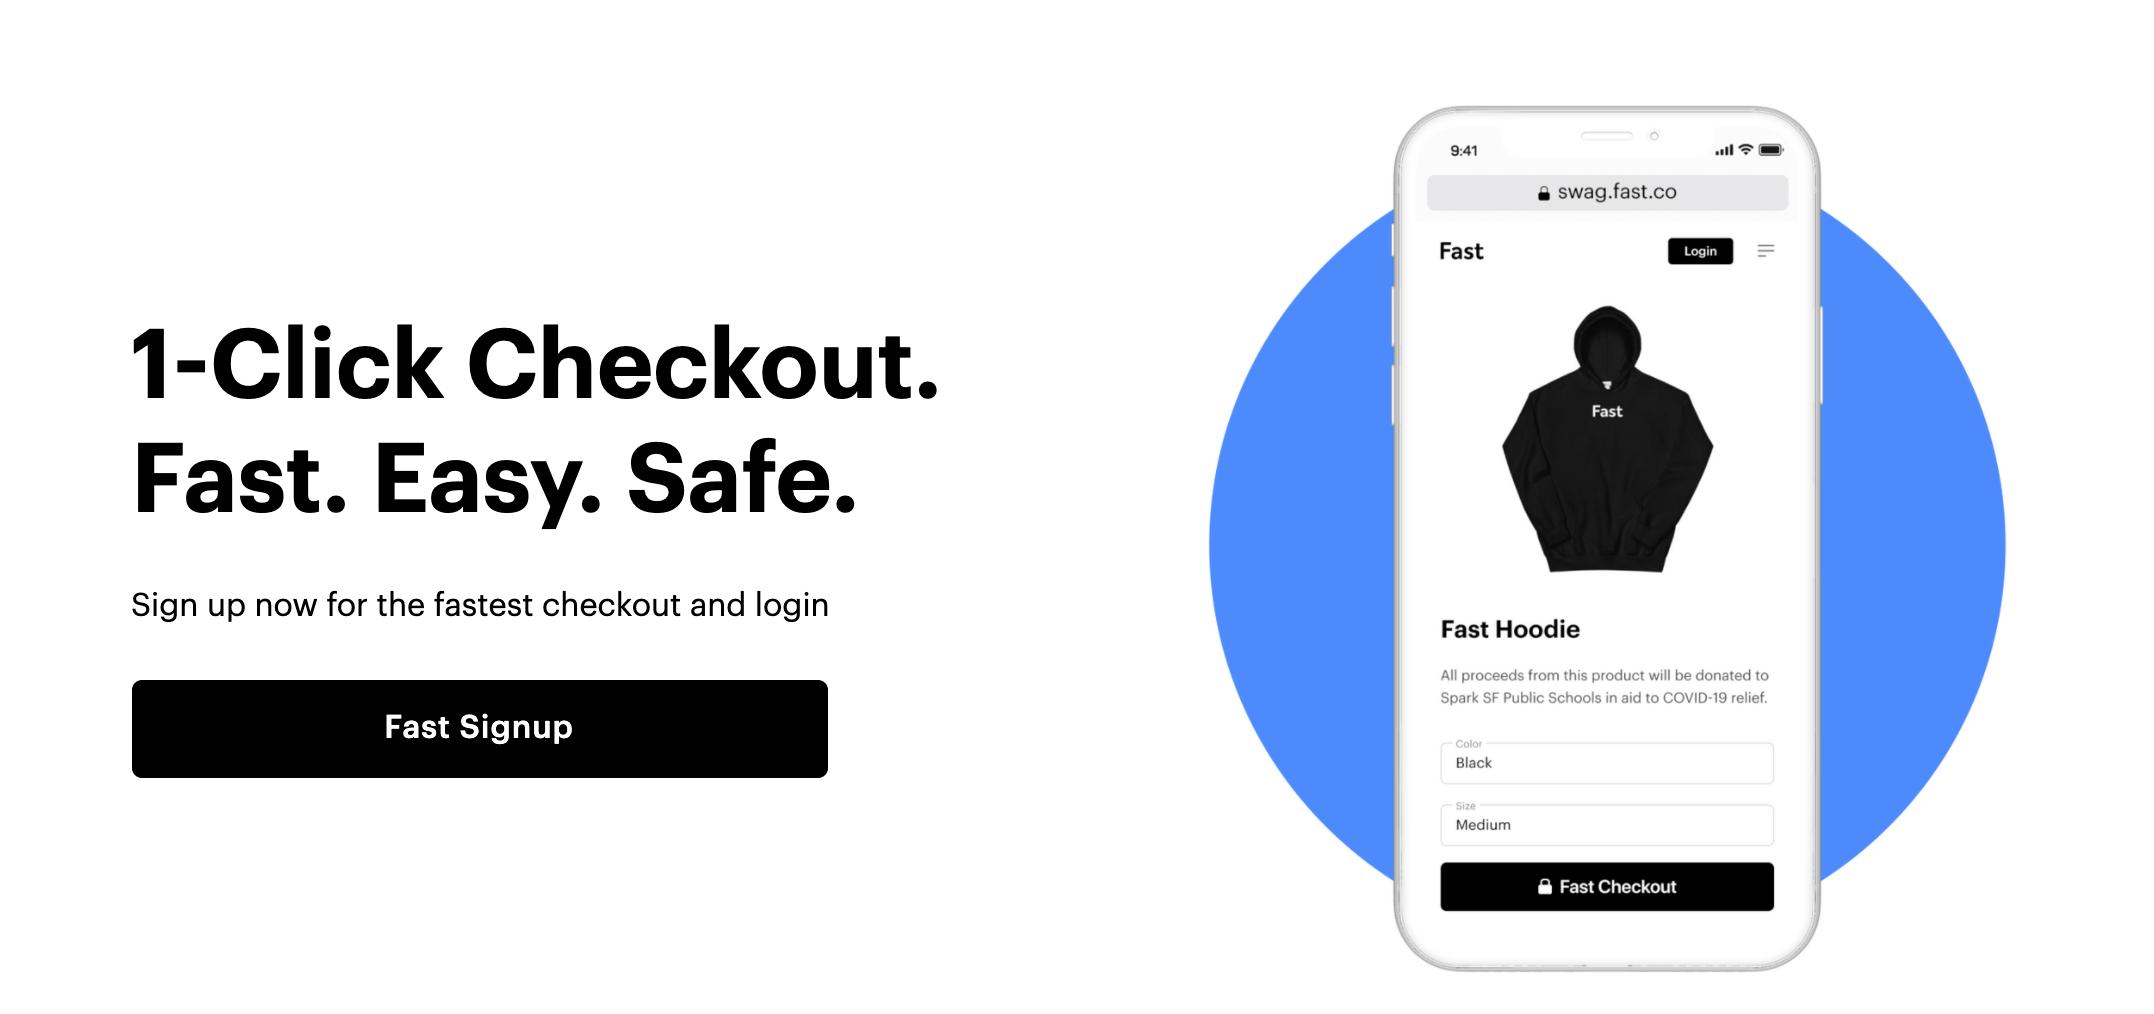 Fast e-commerce checkout service